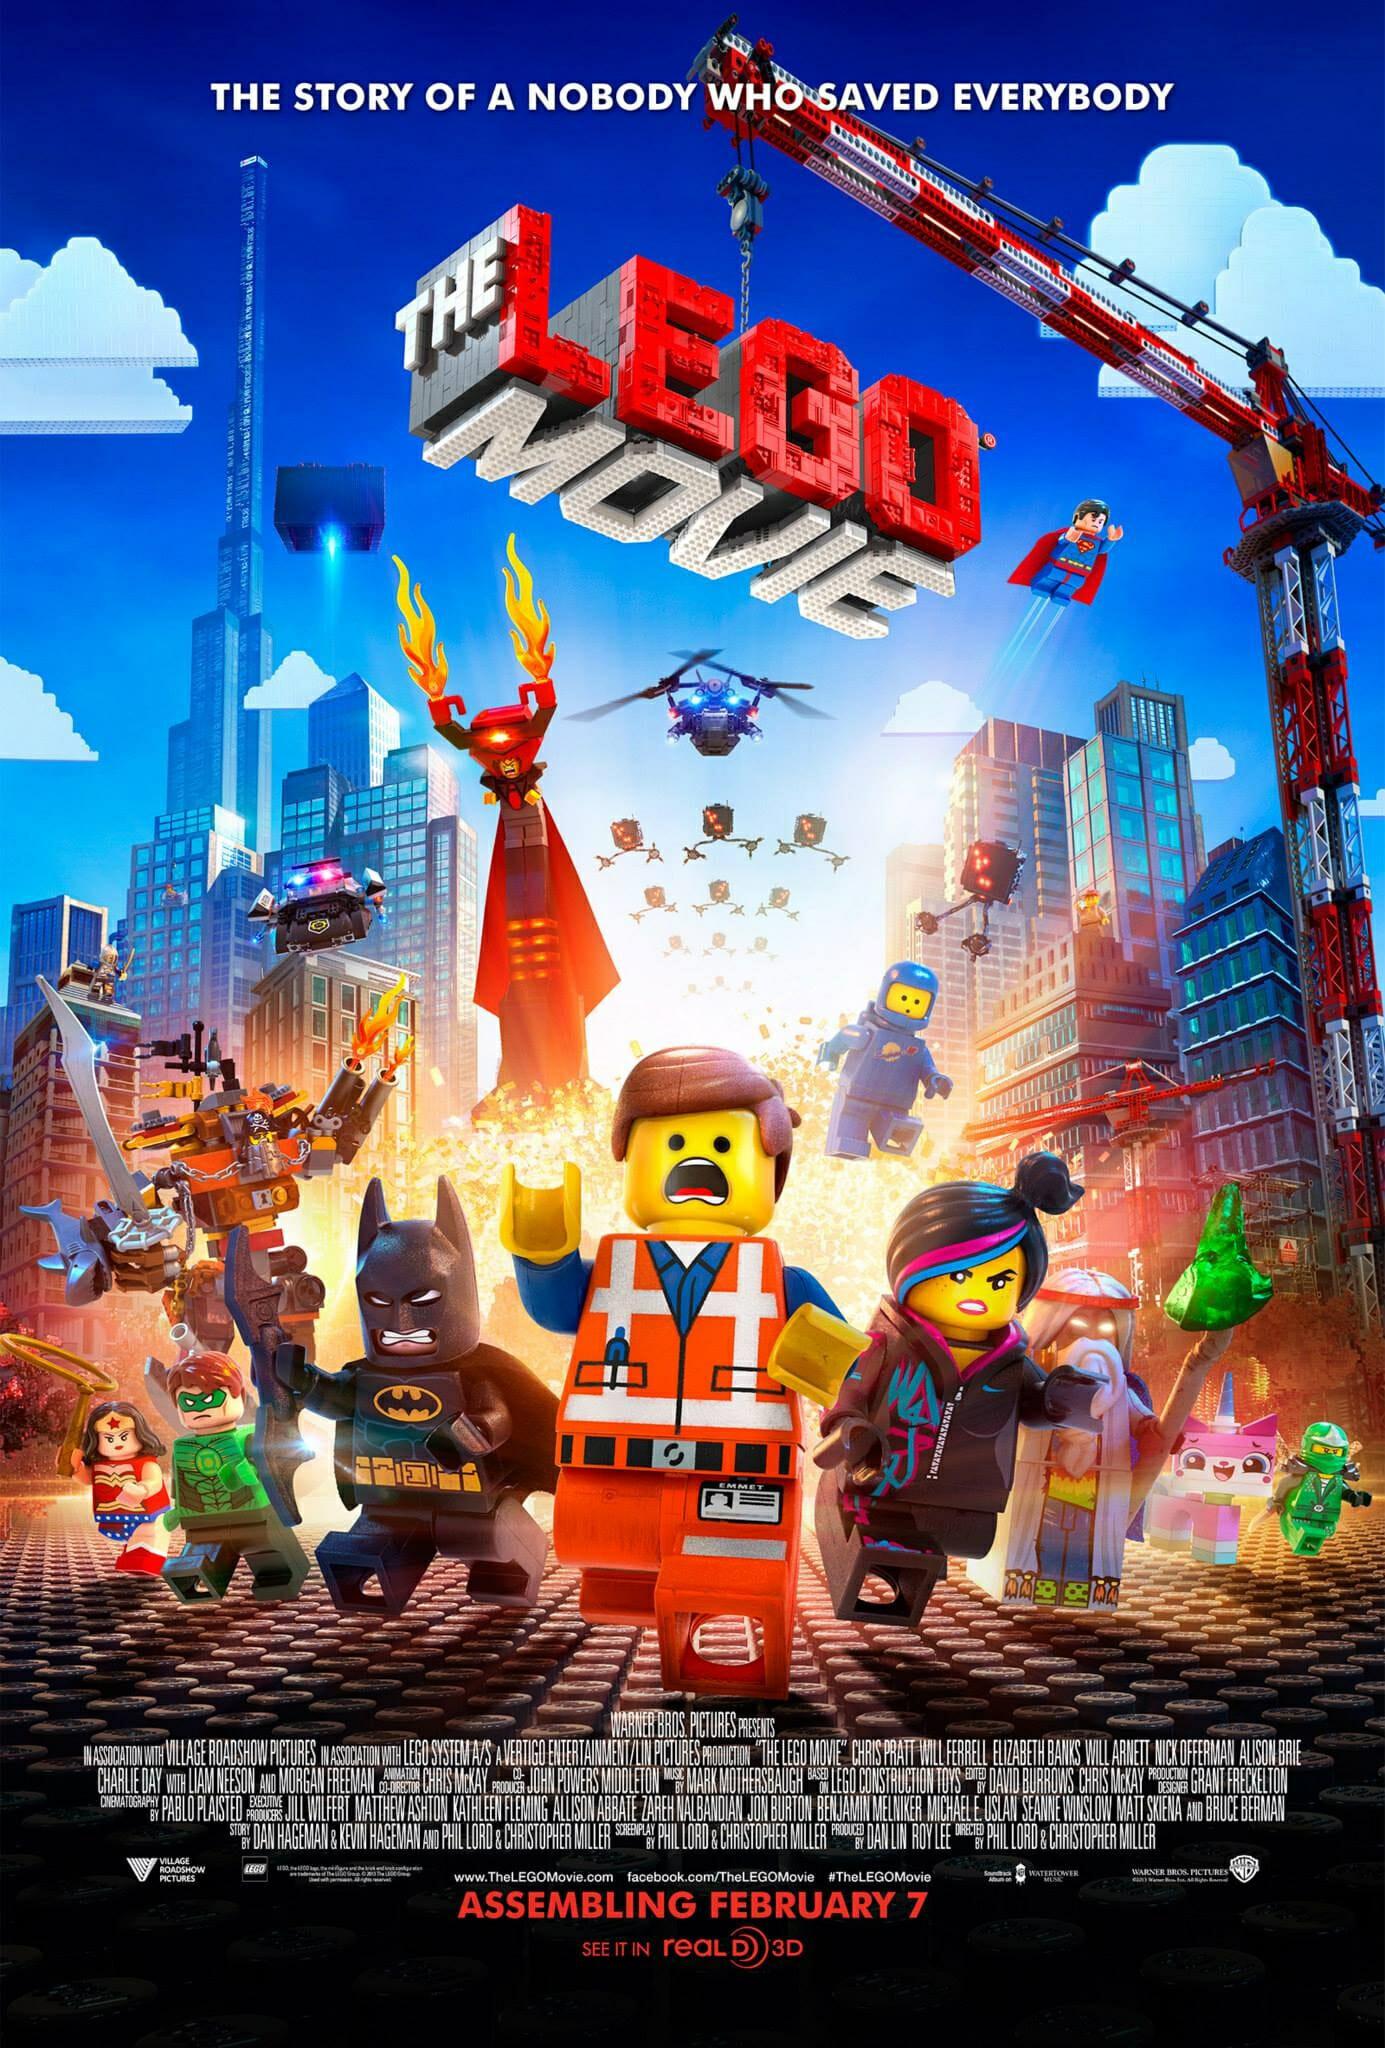 LEGO-Movie-Poster-2014